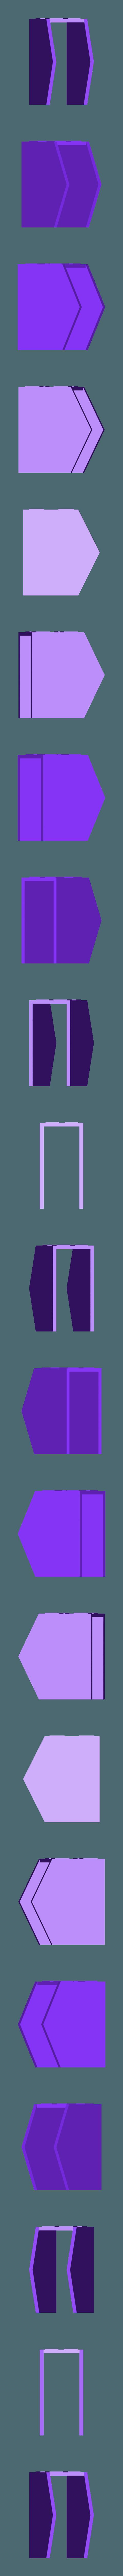 2018 EXTRUCTURA 02.stl Download STL file Townhouse Escala (N) • 3D print model, 3DAKSER